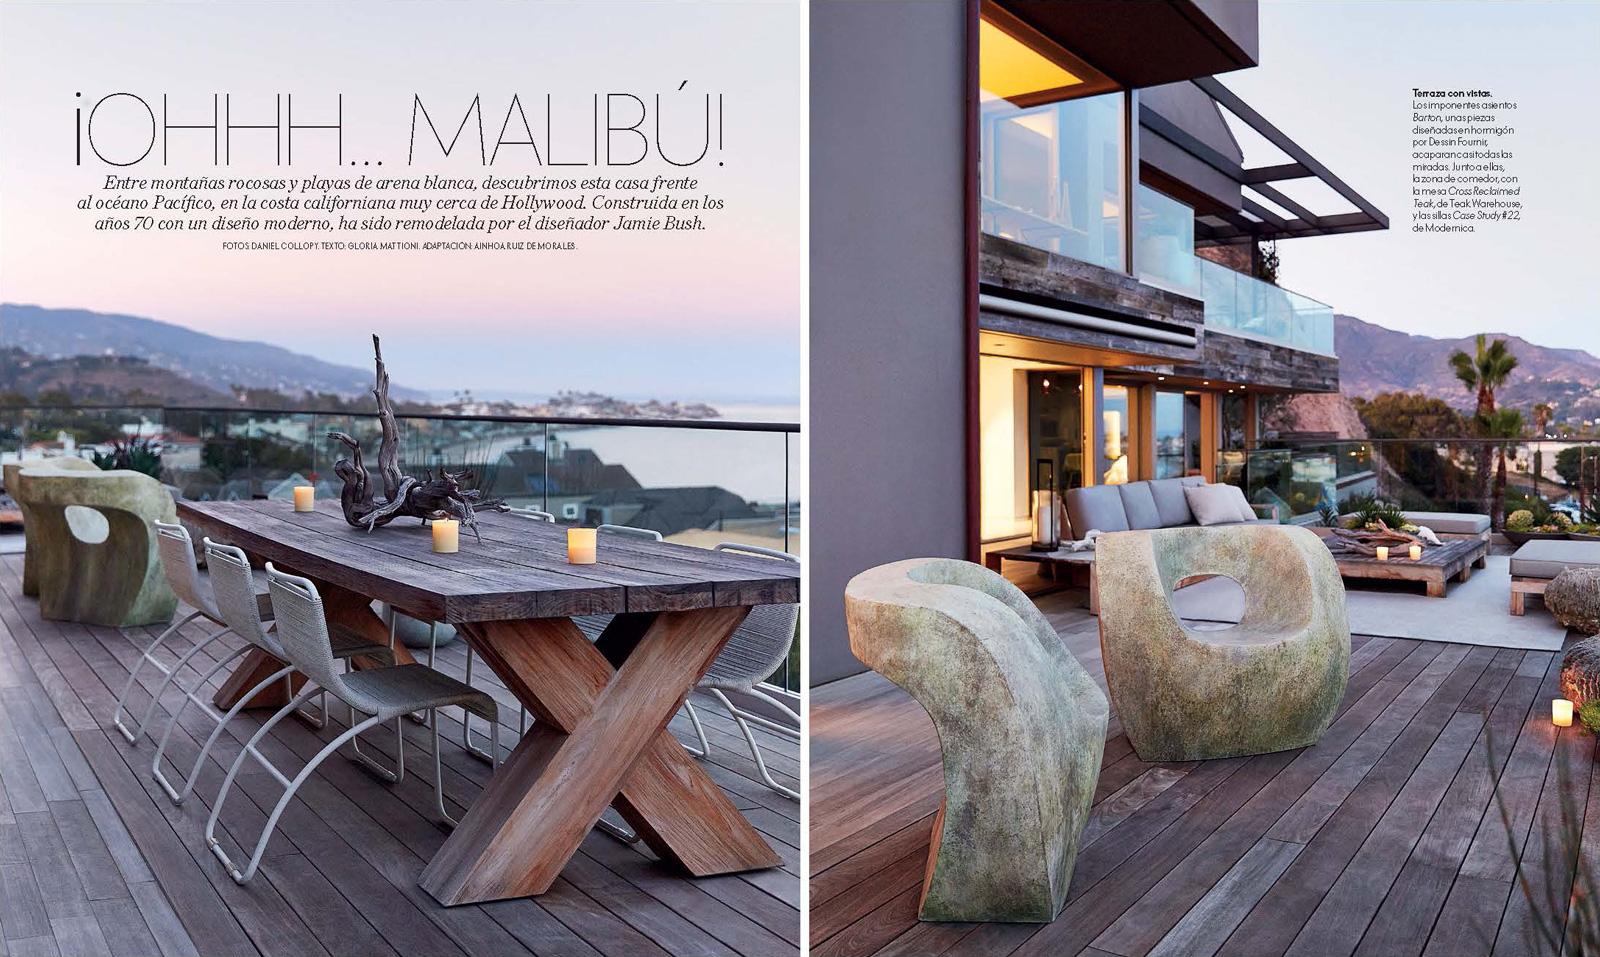 ED-176-Malibu-Gloria-Mattioni-Daniel_Page_1.jpg